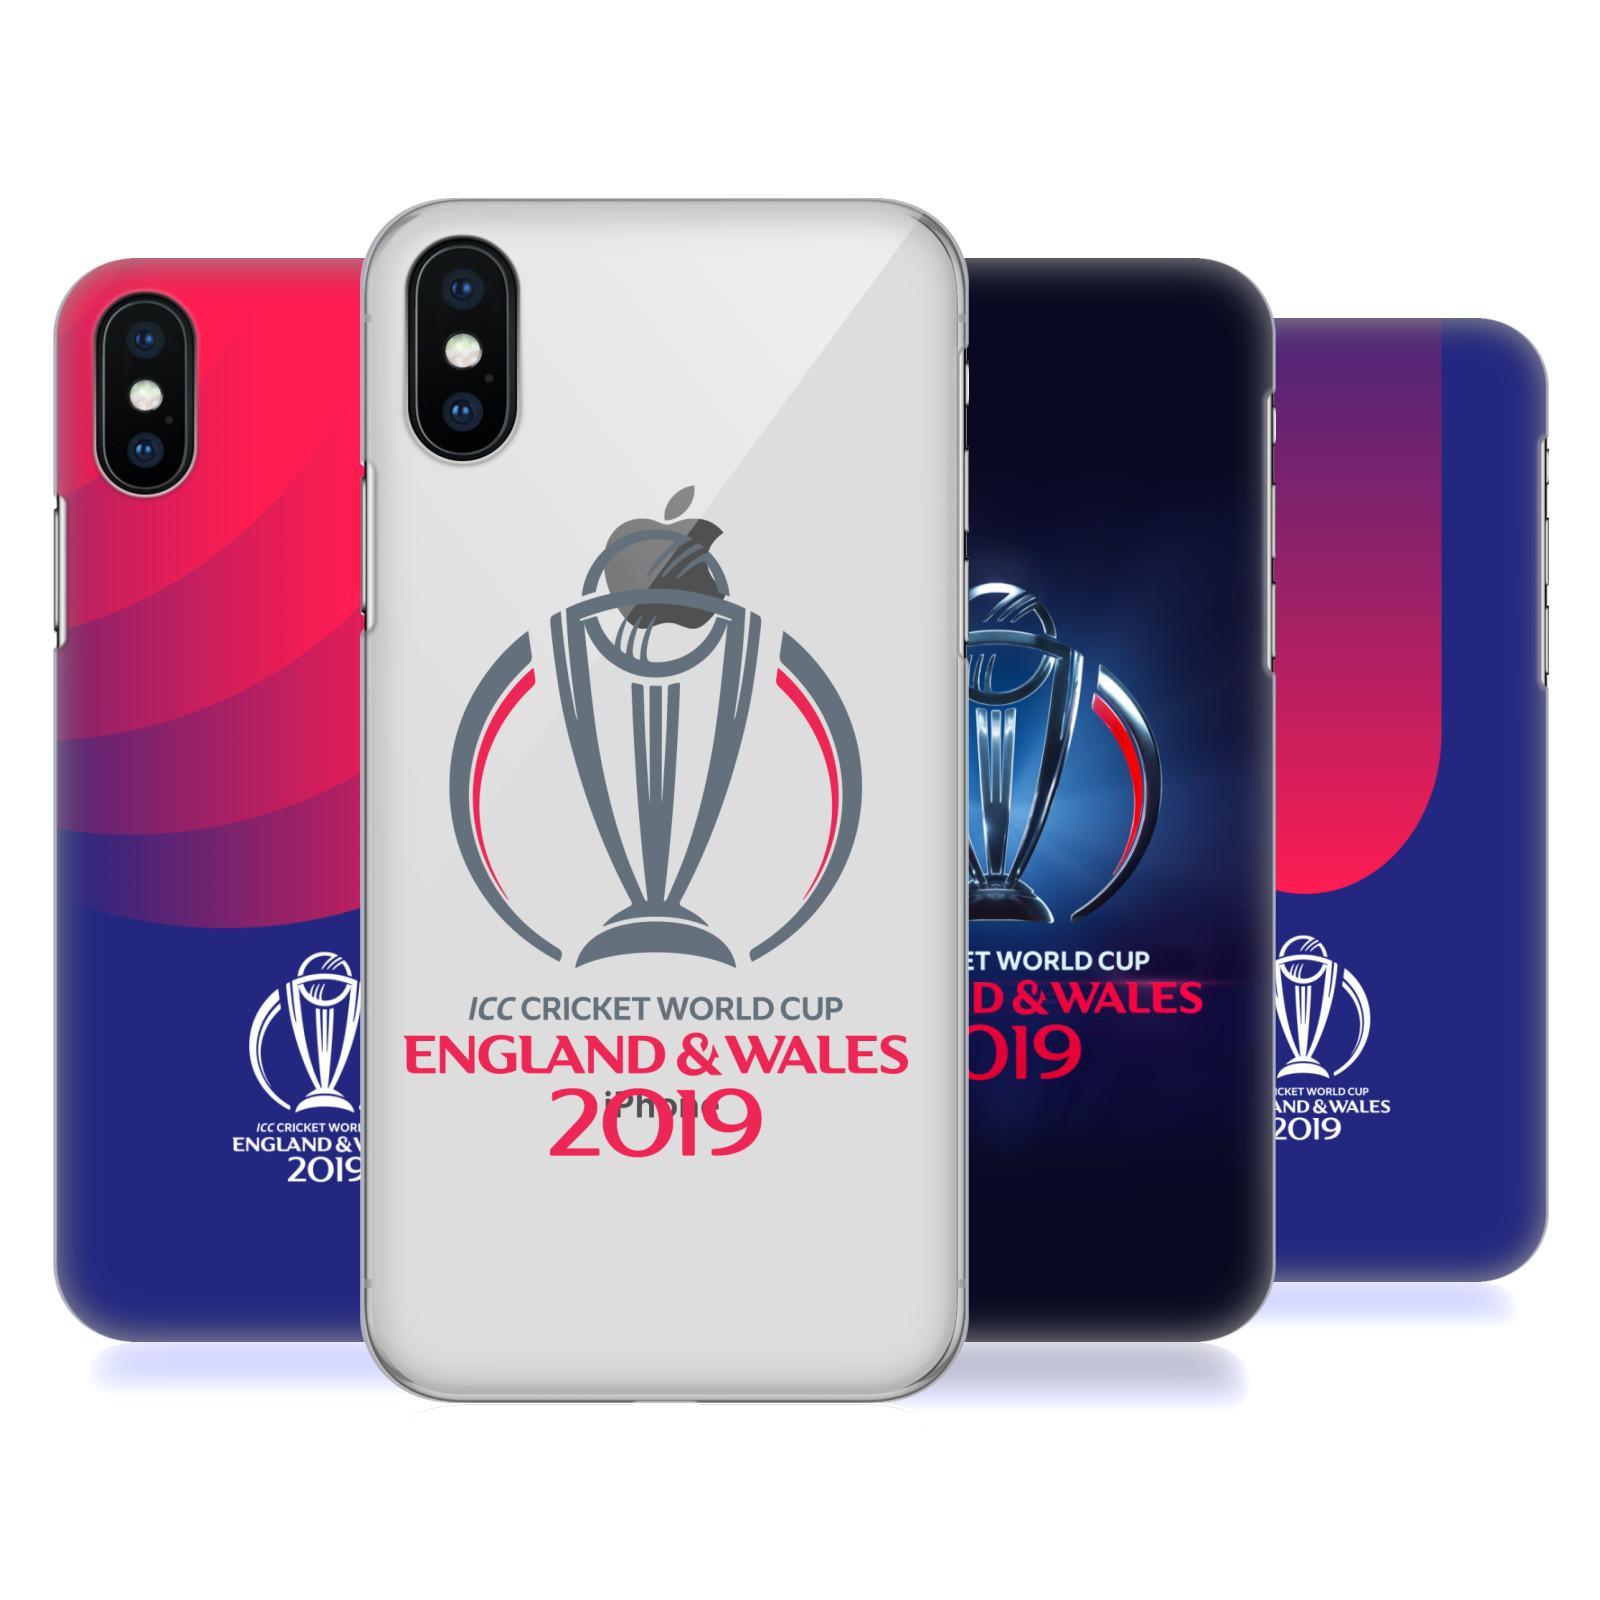 International Cricket Council CWC 2019 Cricket World Cup